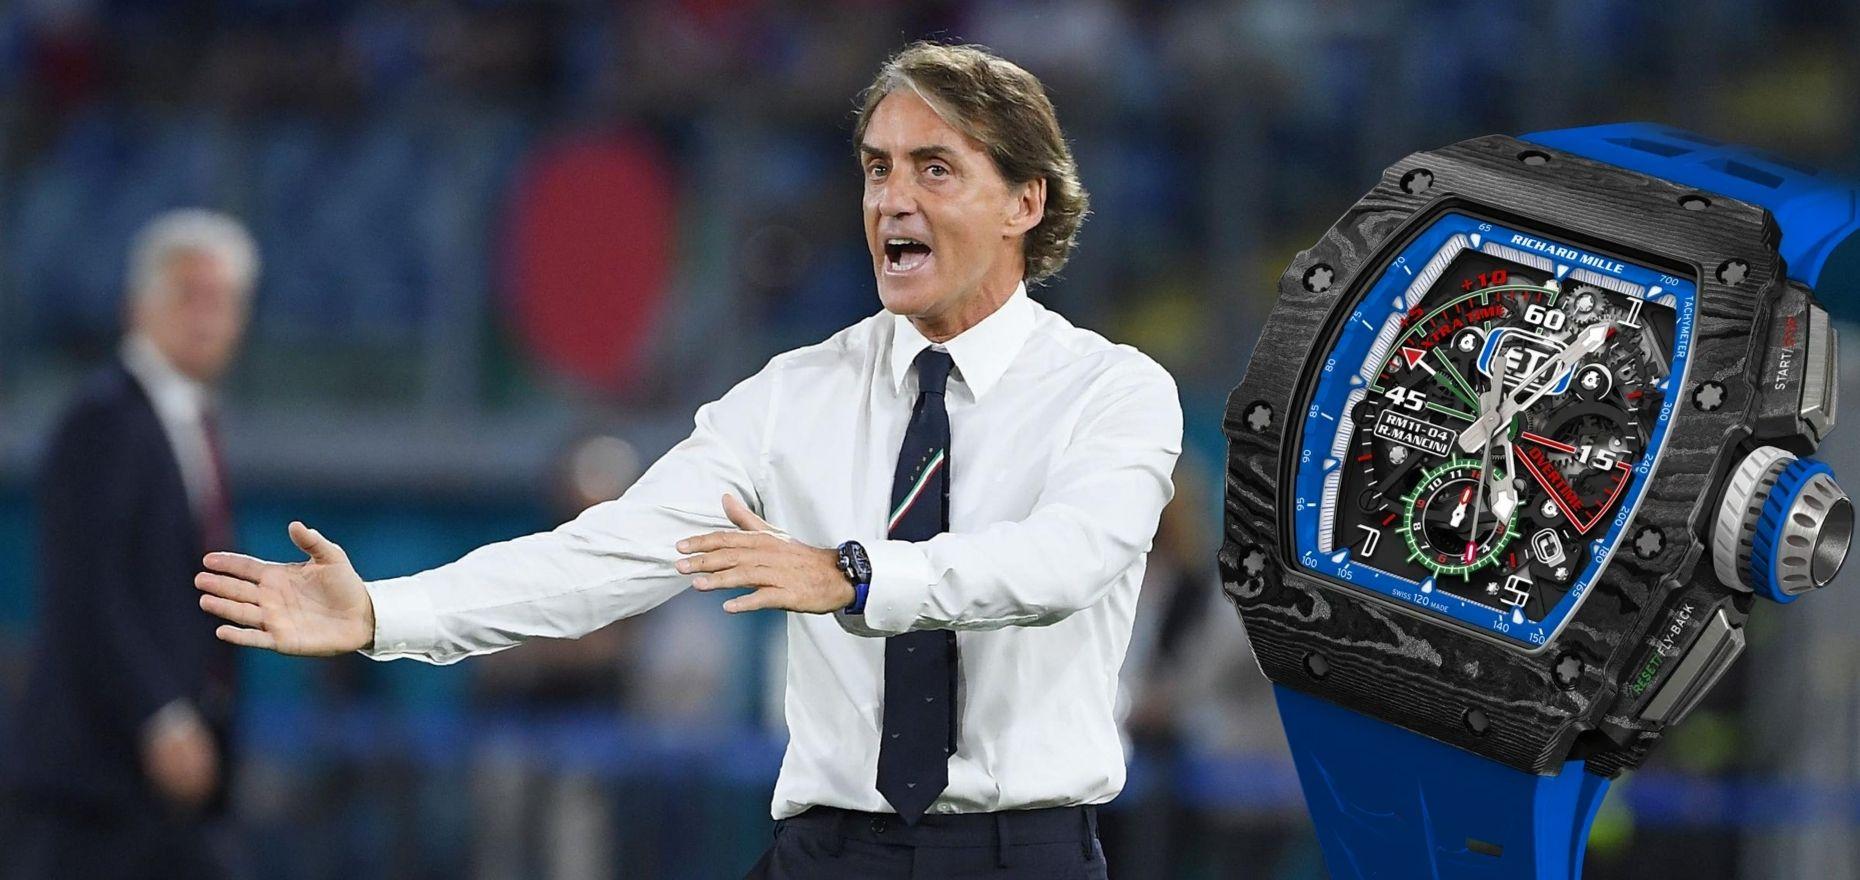 The Half-Million-Euro Watch of Italian Coach Roberto Mancini: RM 11-04 Automatic Flyback Chronograph Roberto Mancini